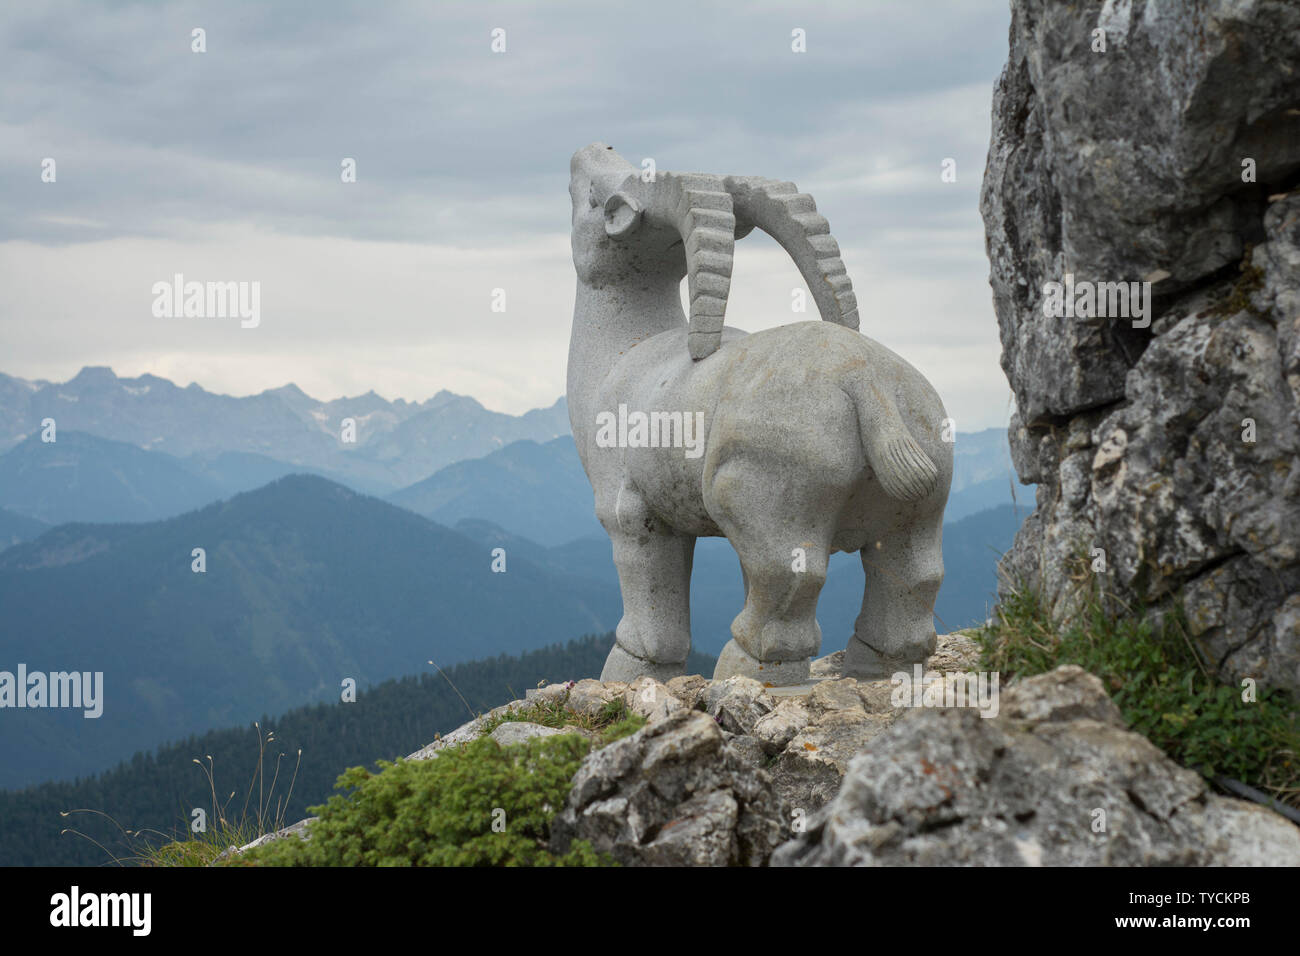 Ibex statue, lenggries, bad toelz, brauneck, bavarian alps, upper bavaria, bavaria, germany - Stock Image